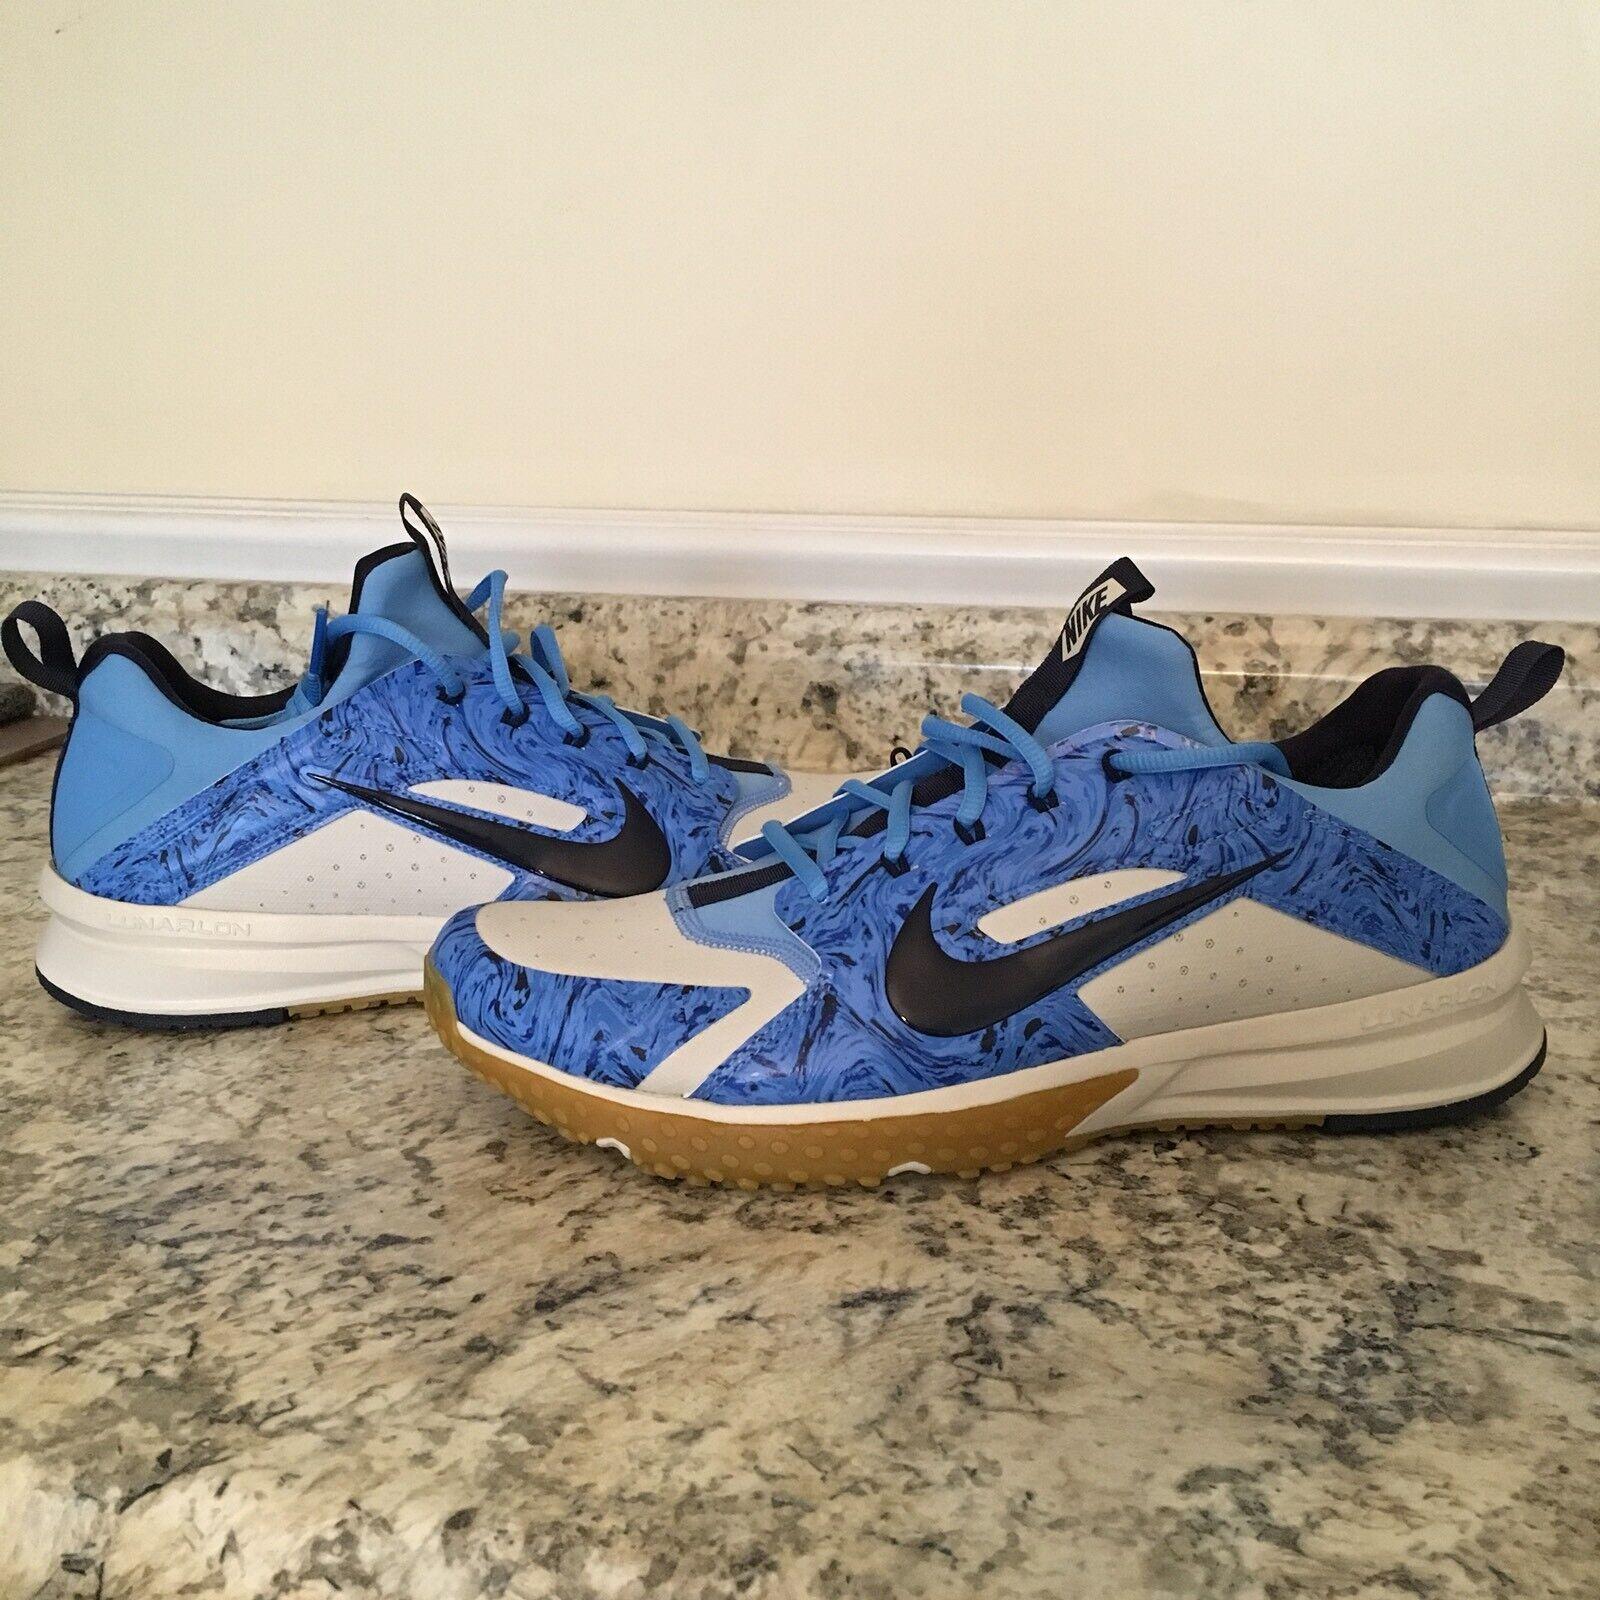 NEW Nike Air Huarache Turf Baseball Trainers bluee 923435-004 Men's Sz. 12